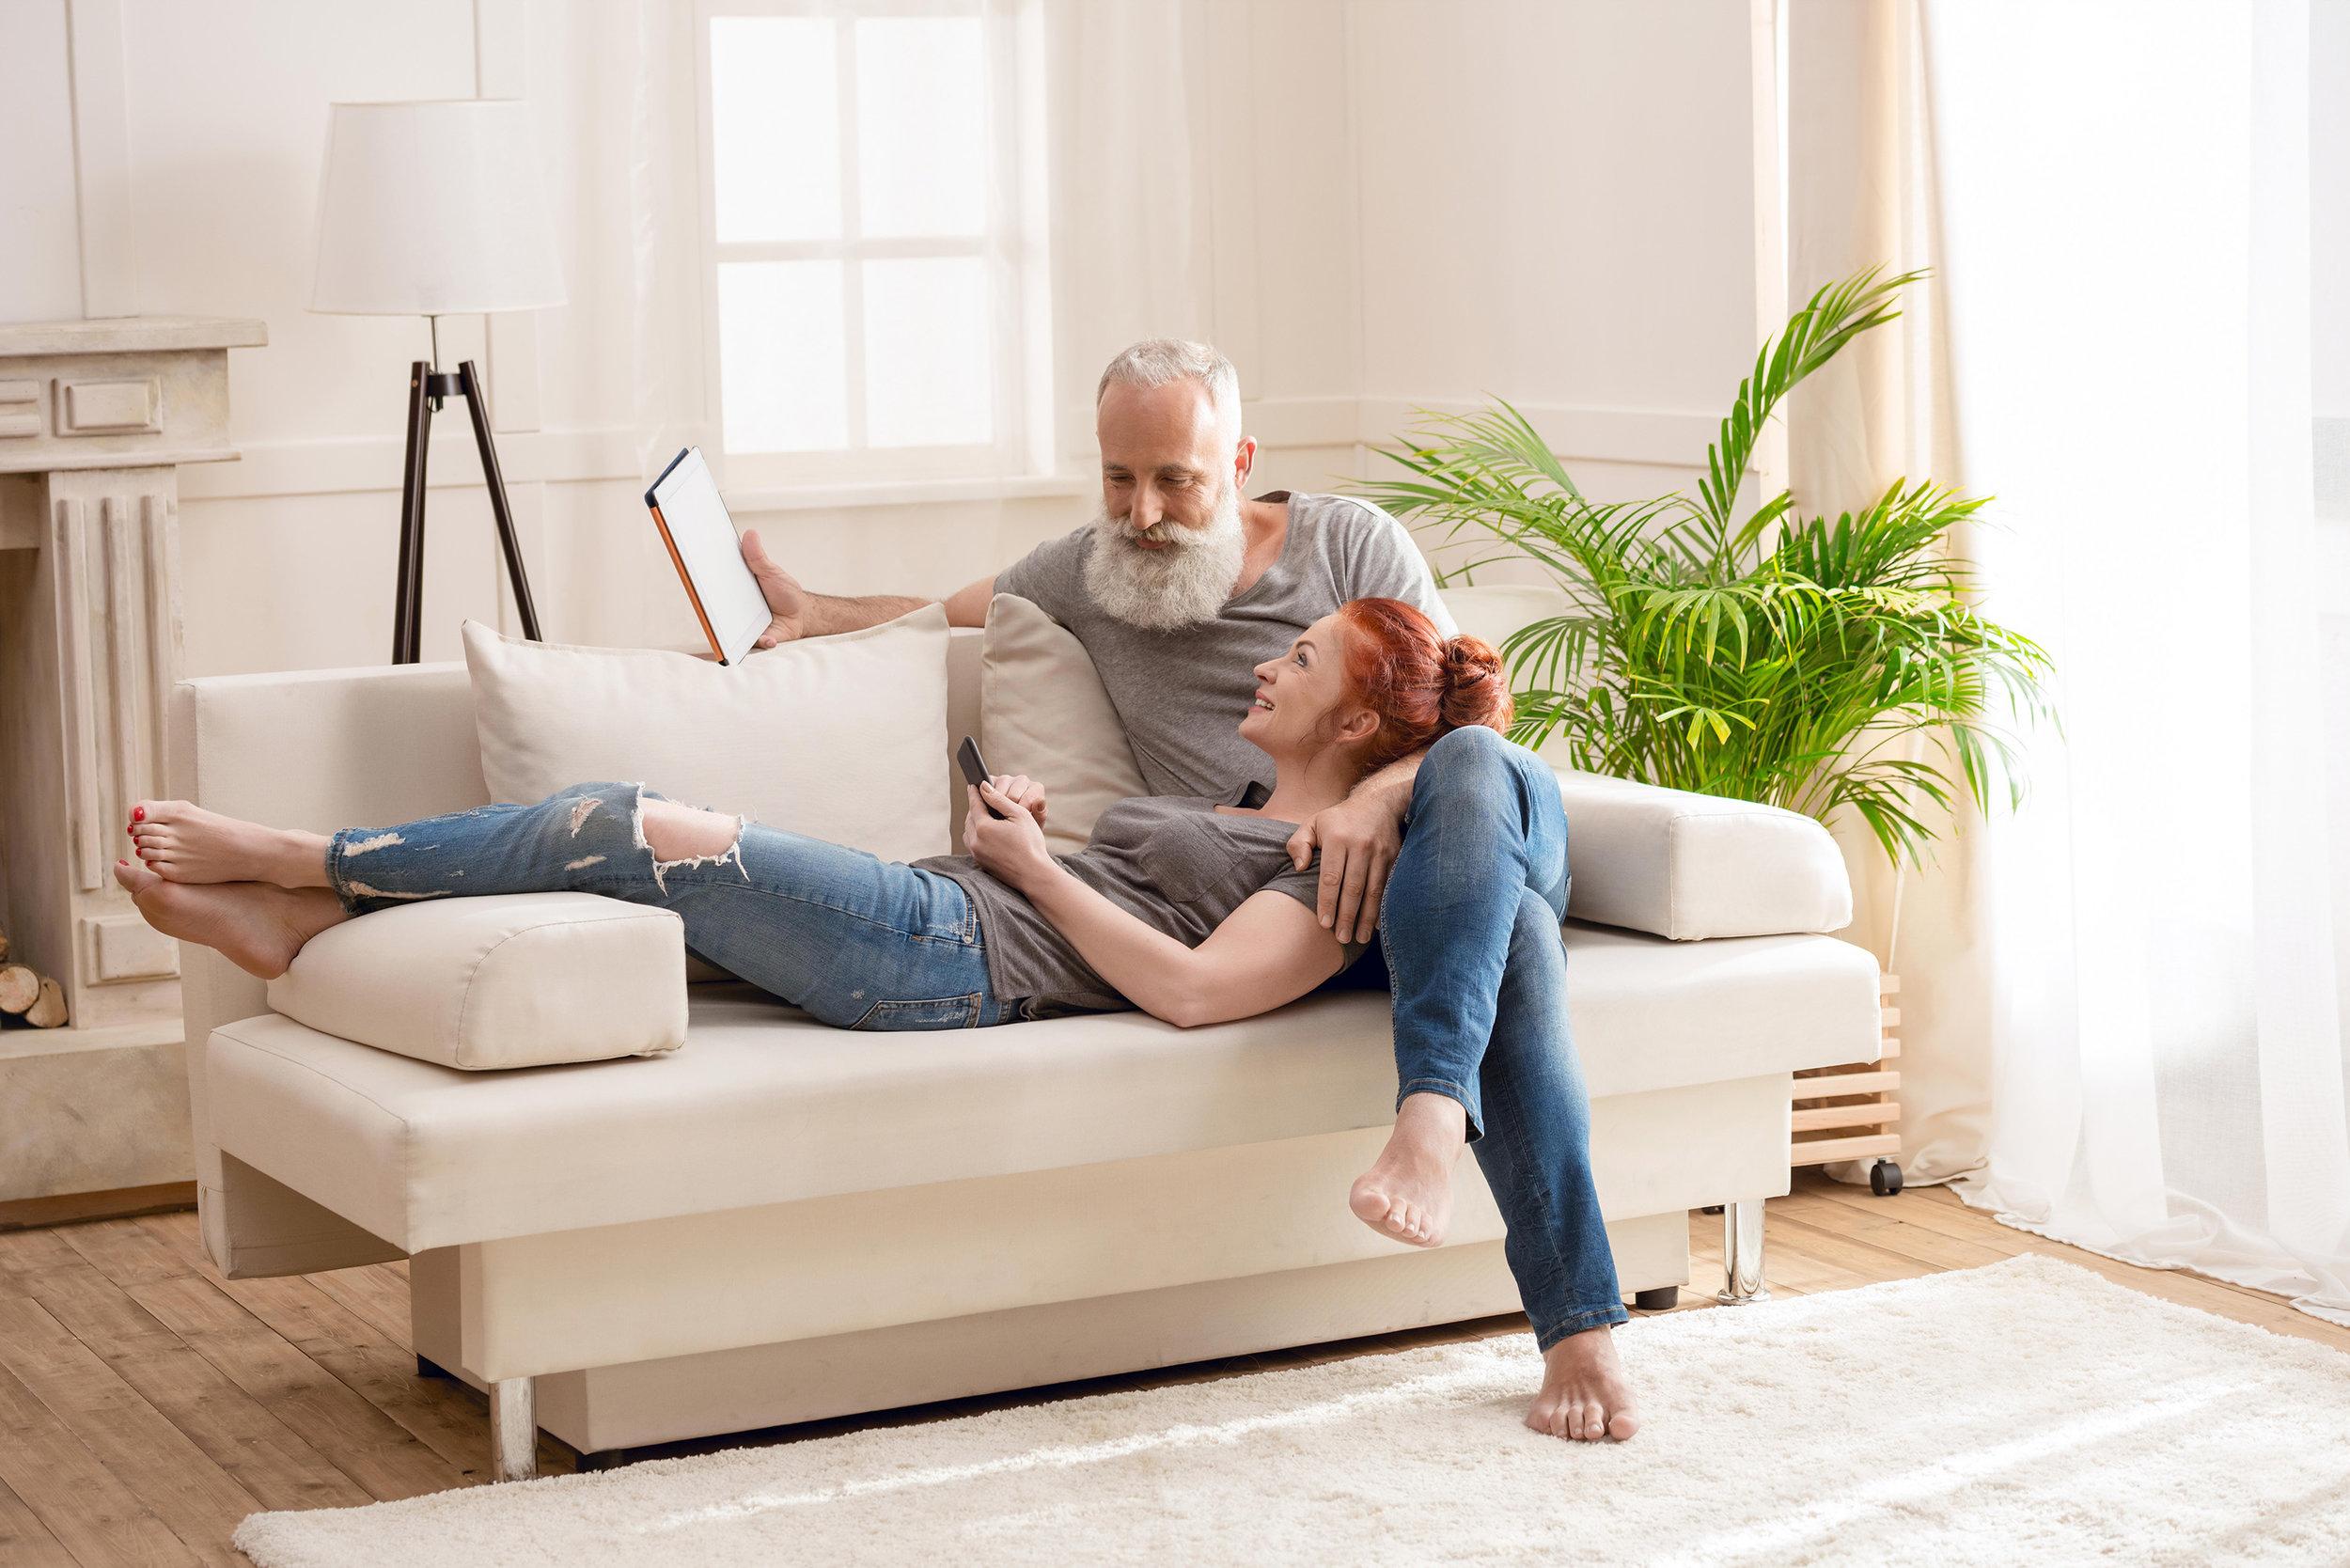 couple-relaxing-in-clean-living-room.jpg